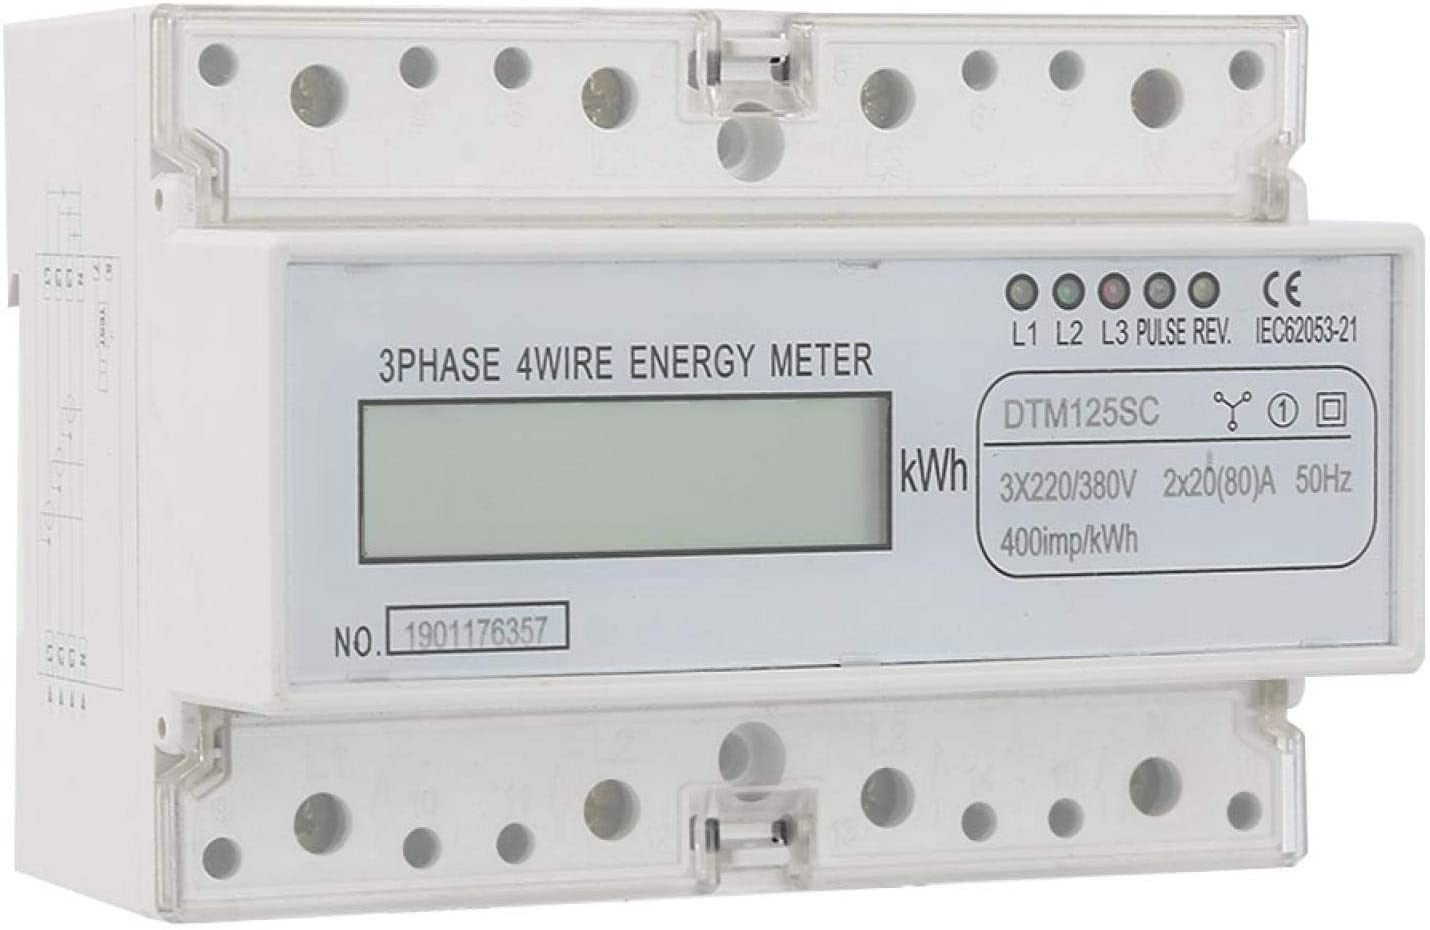 Medidor de potencia eléctrica, medidor de potencia, consumo de energía práctico con LCD Circuito integrado grande duradero 220 / 380V 20-80A para conexión directa Nivel 1 Precisión